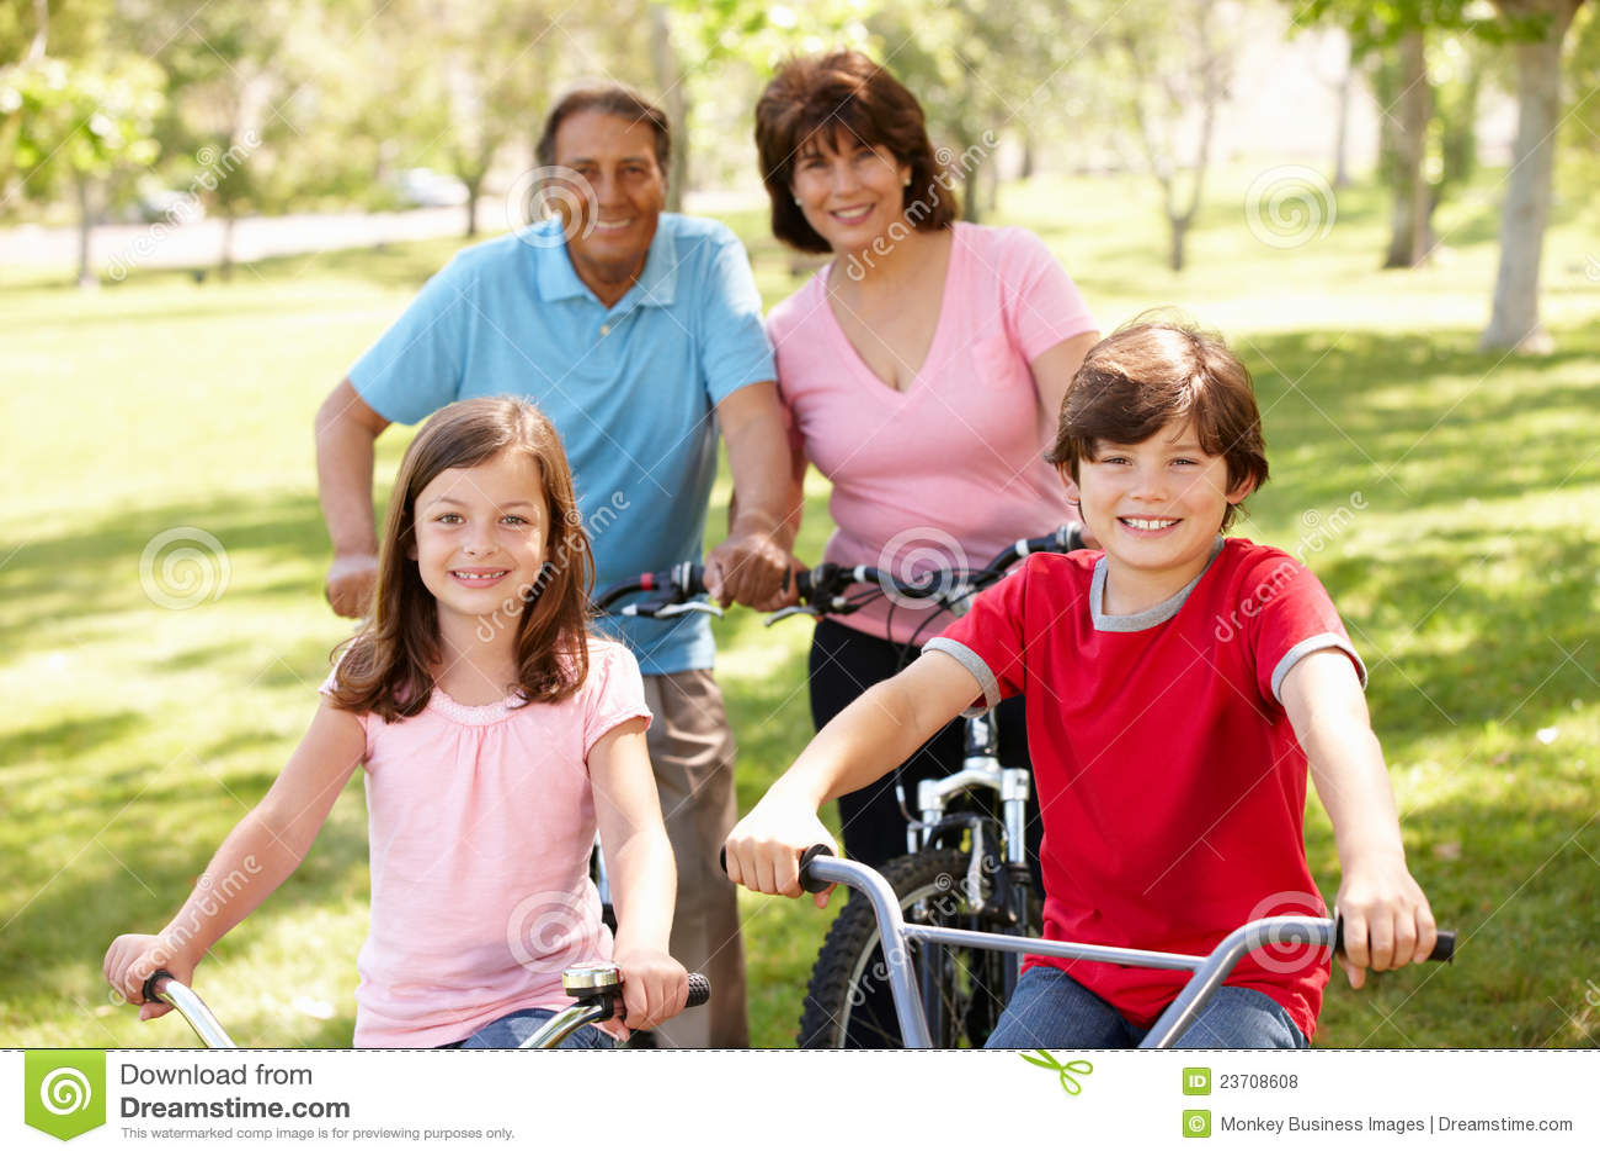 Hispanic family riding bikes in park